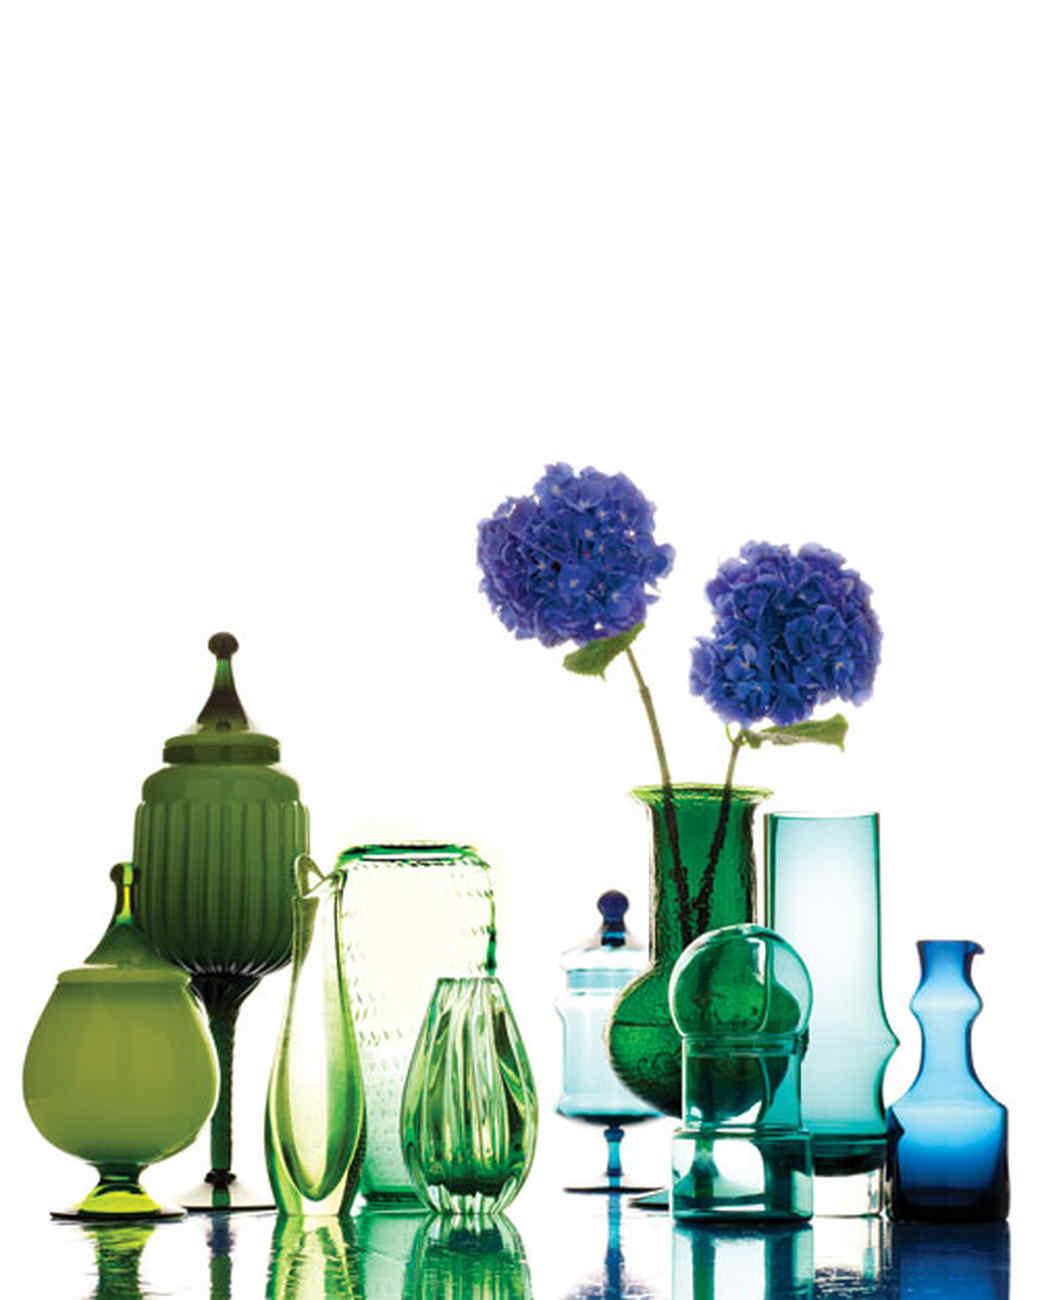 glass-vases-jars-0511mld107082.jpg